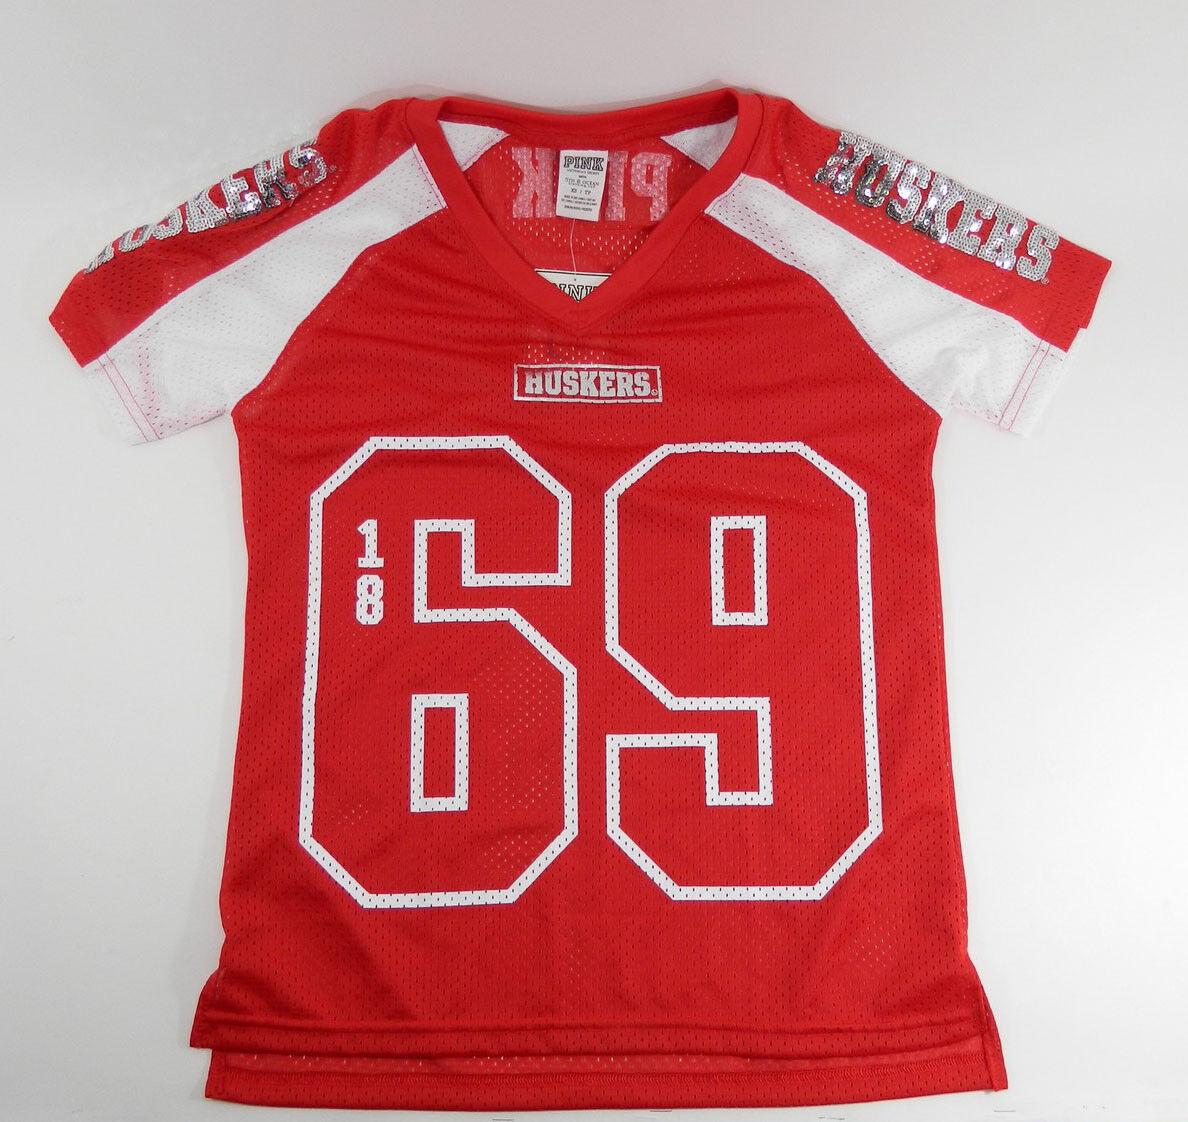 Victoria's Secret PINK Collegiate Collection Nebraska Huskers Jersey Shirt XS